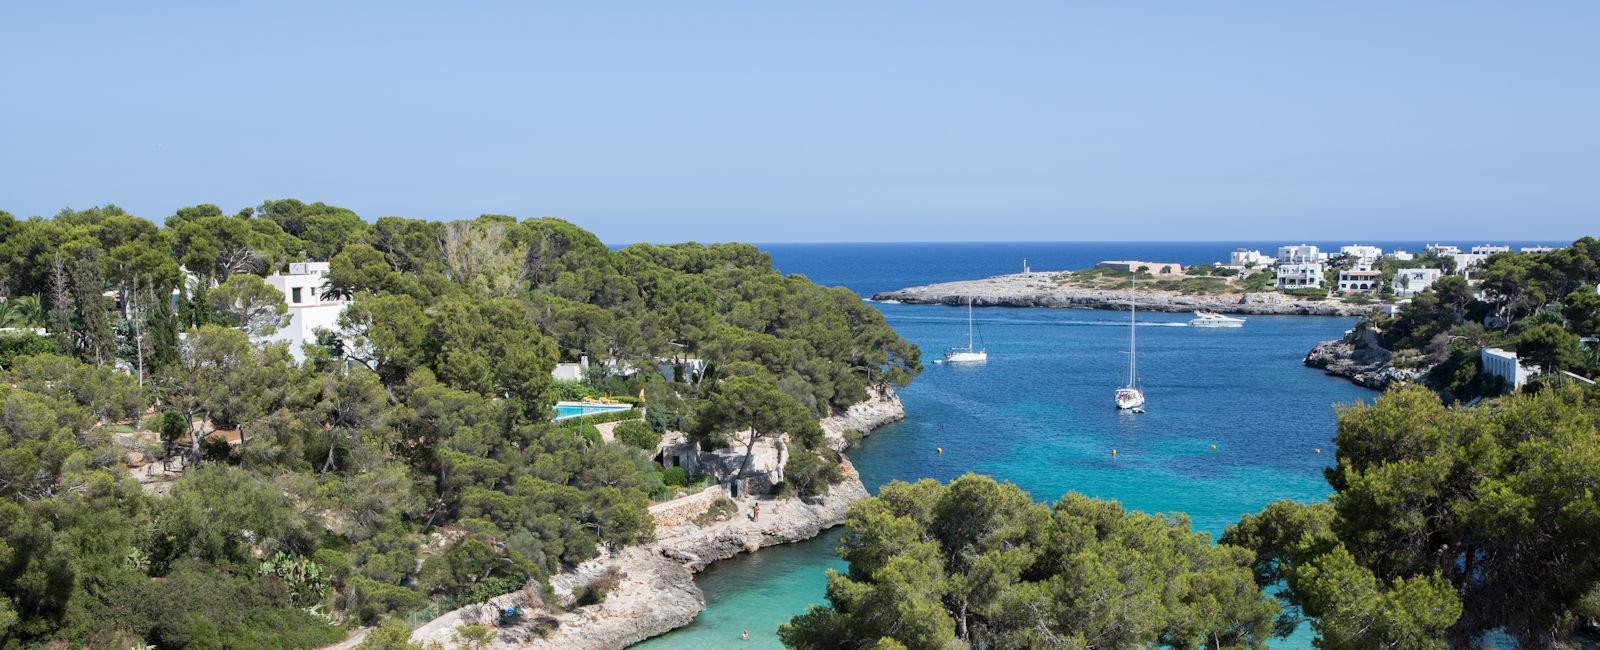 Luxury Cala d'Or holidays